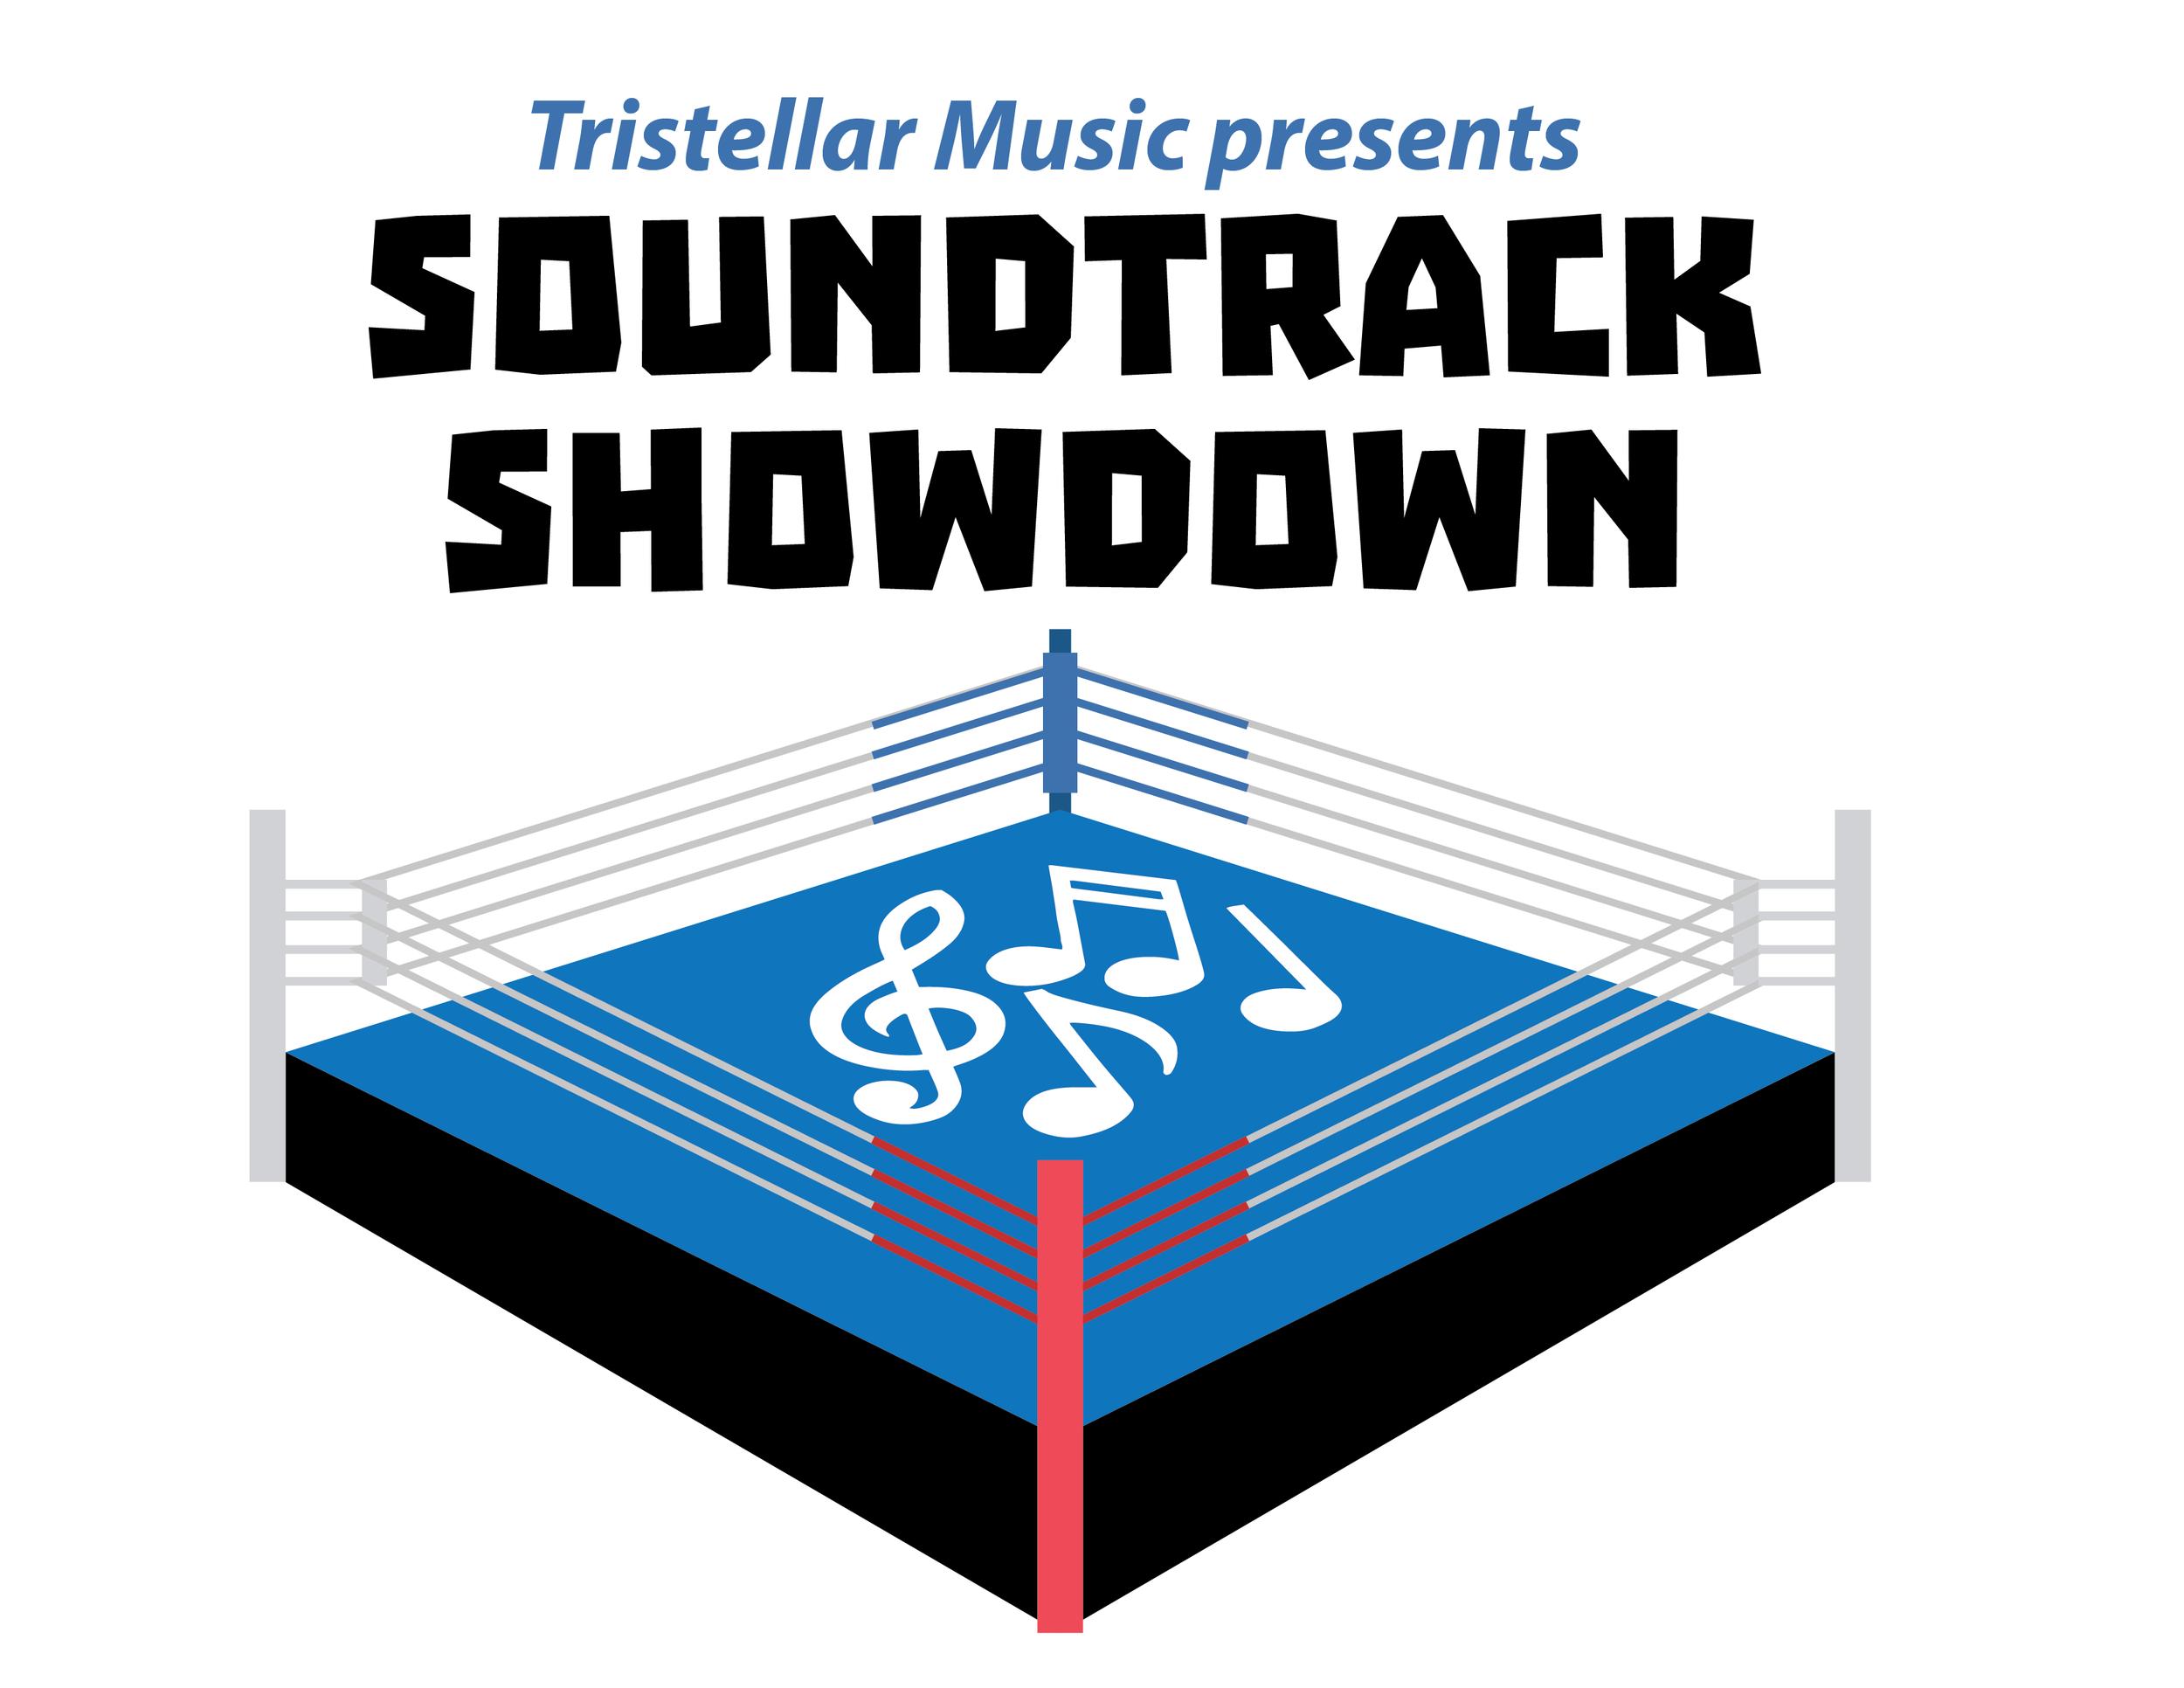 Tristellar_Music_presents_Soundtrack_Showdown_Podcast01.png